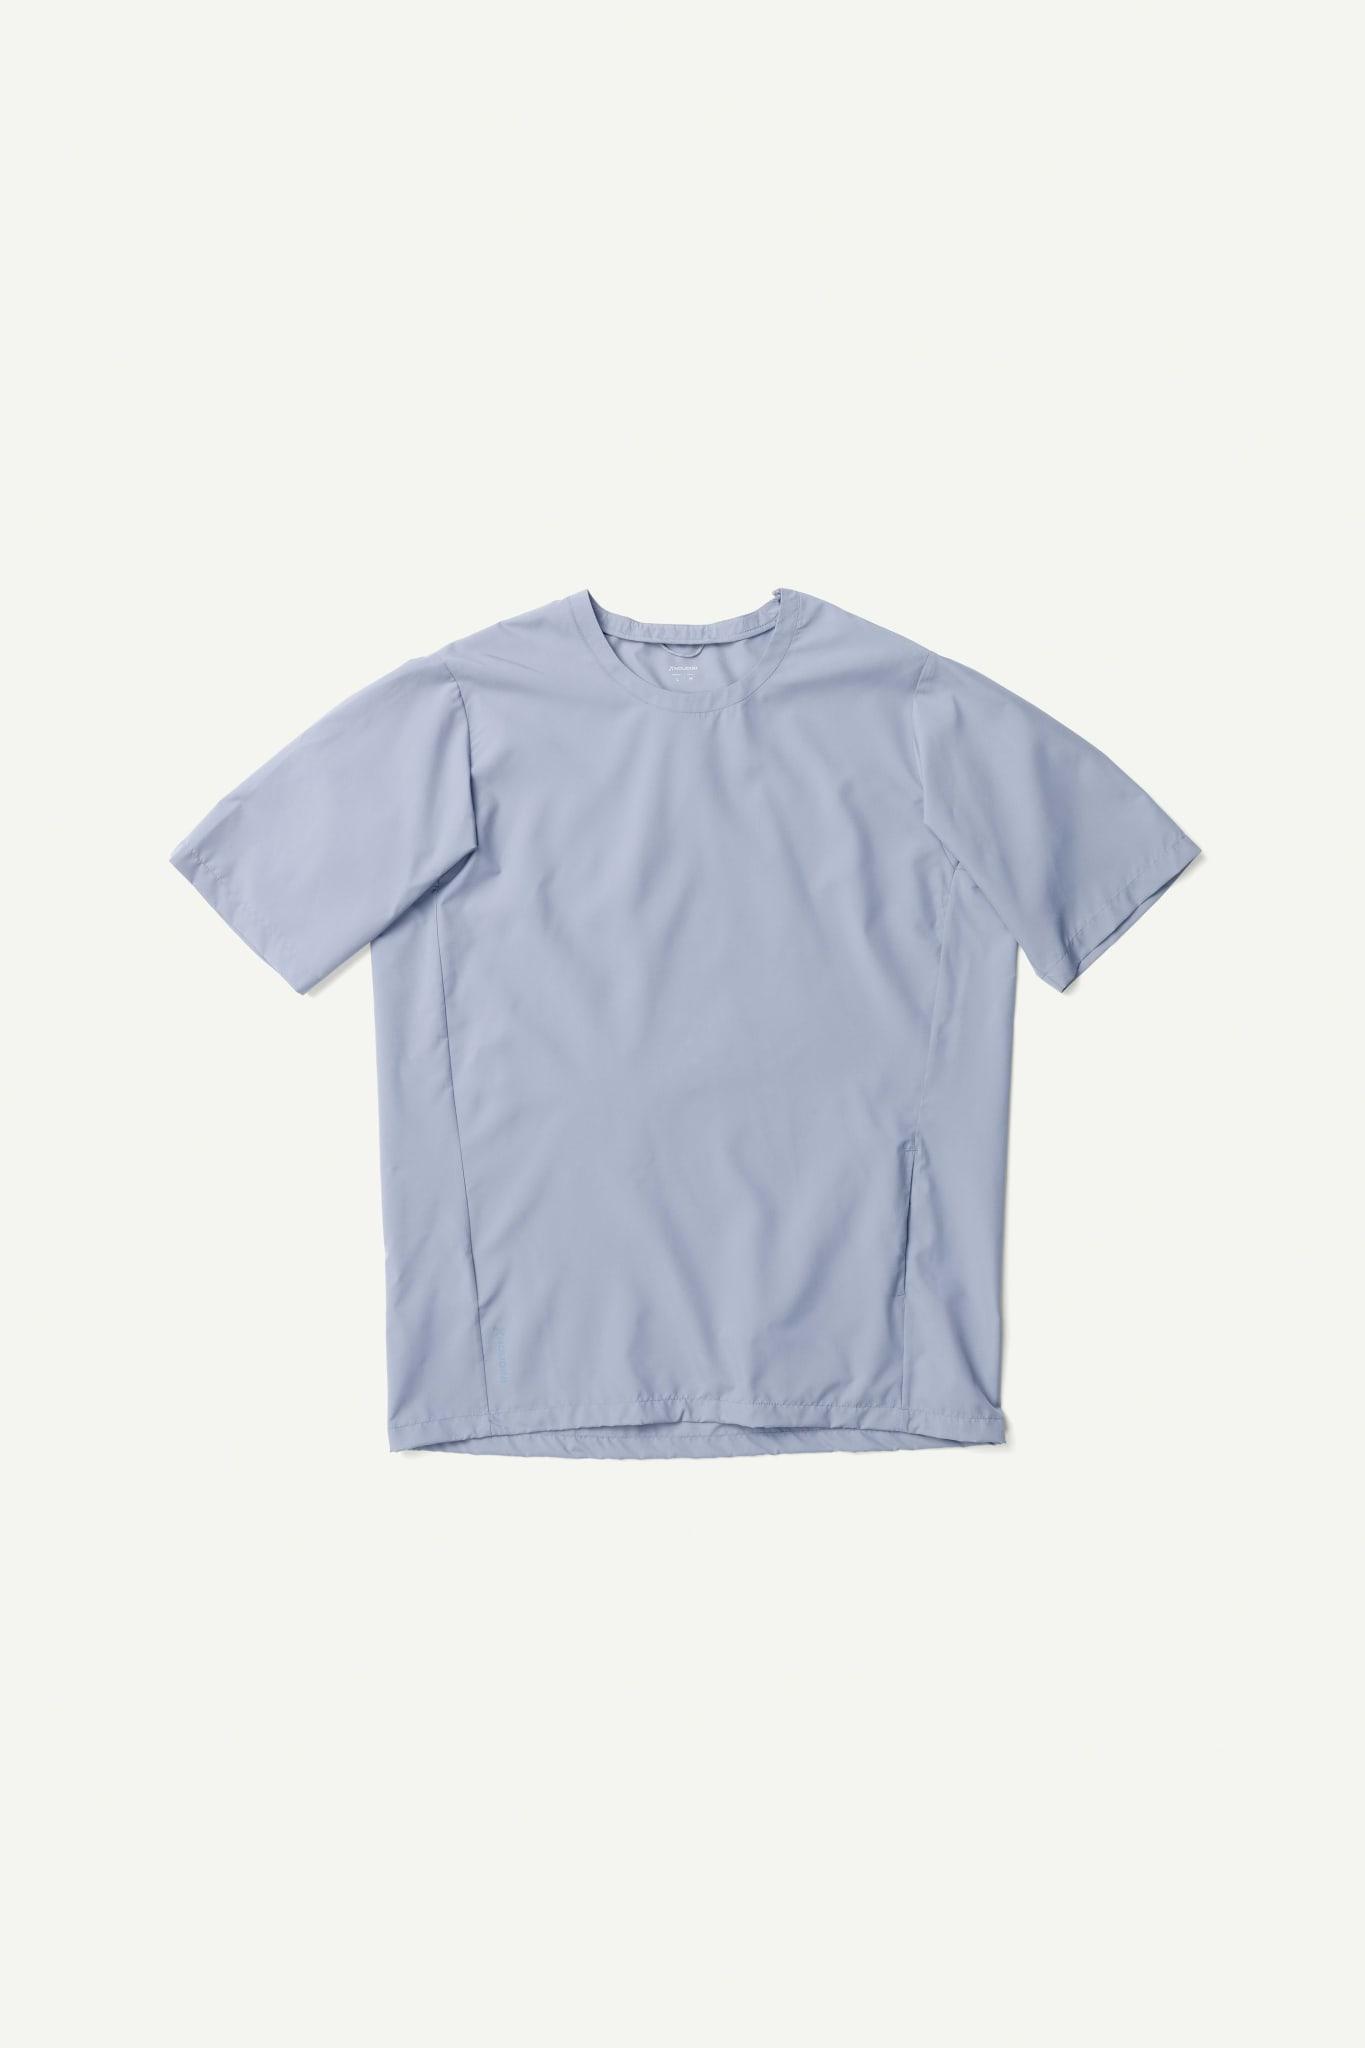 En ny type t-skjorte